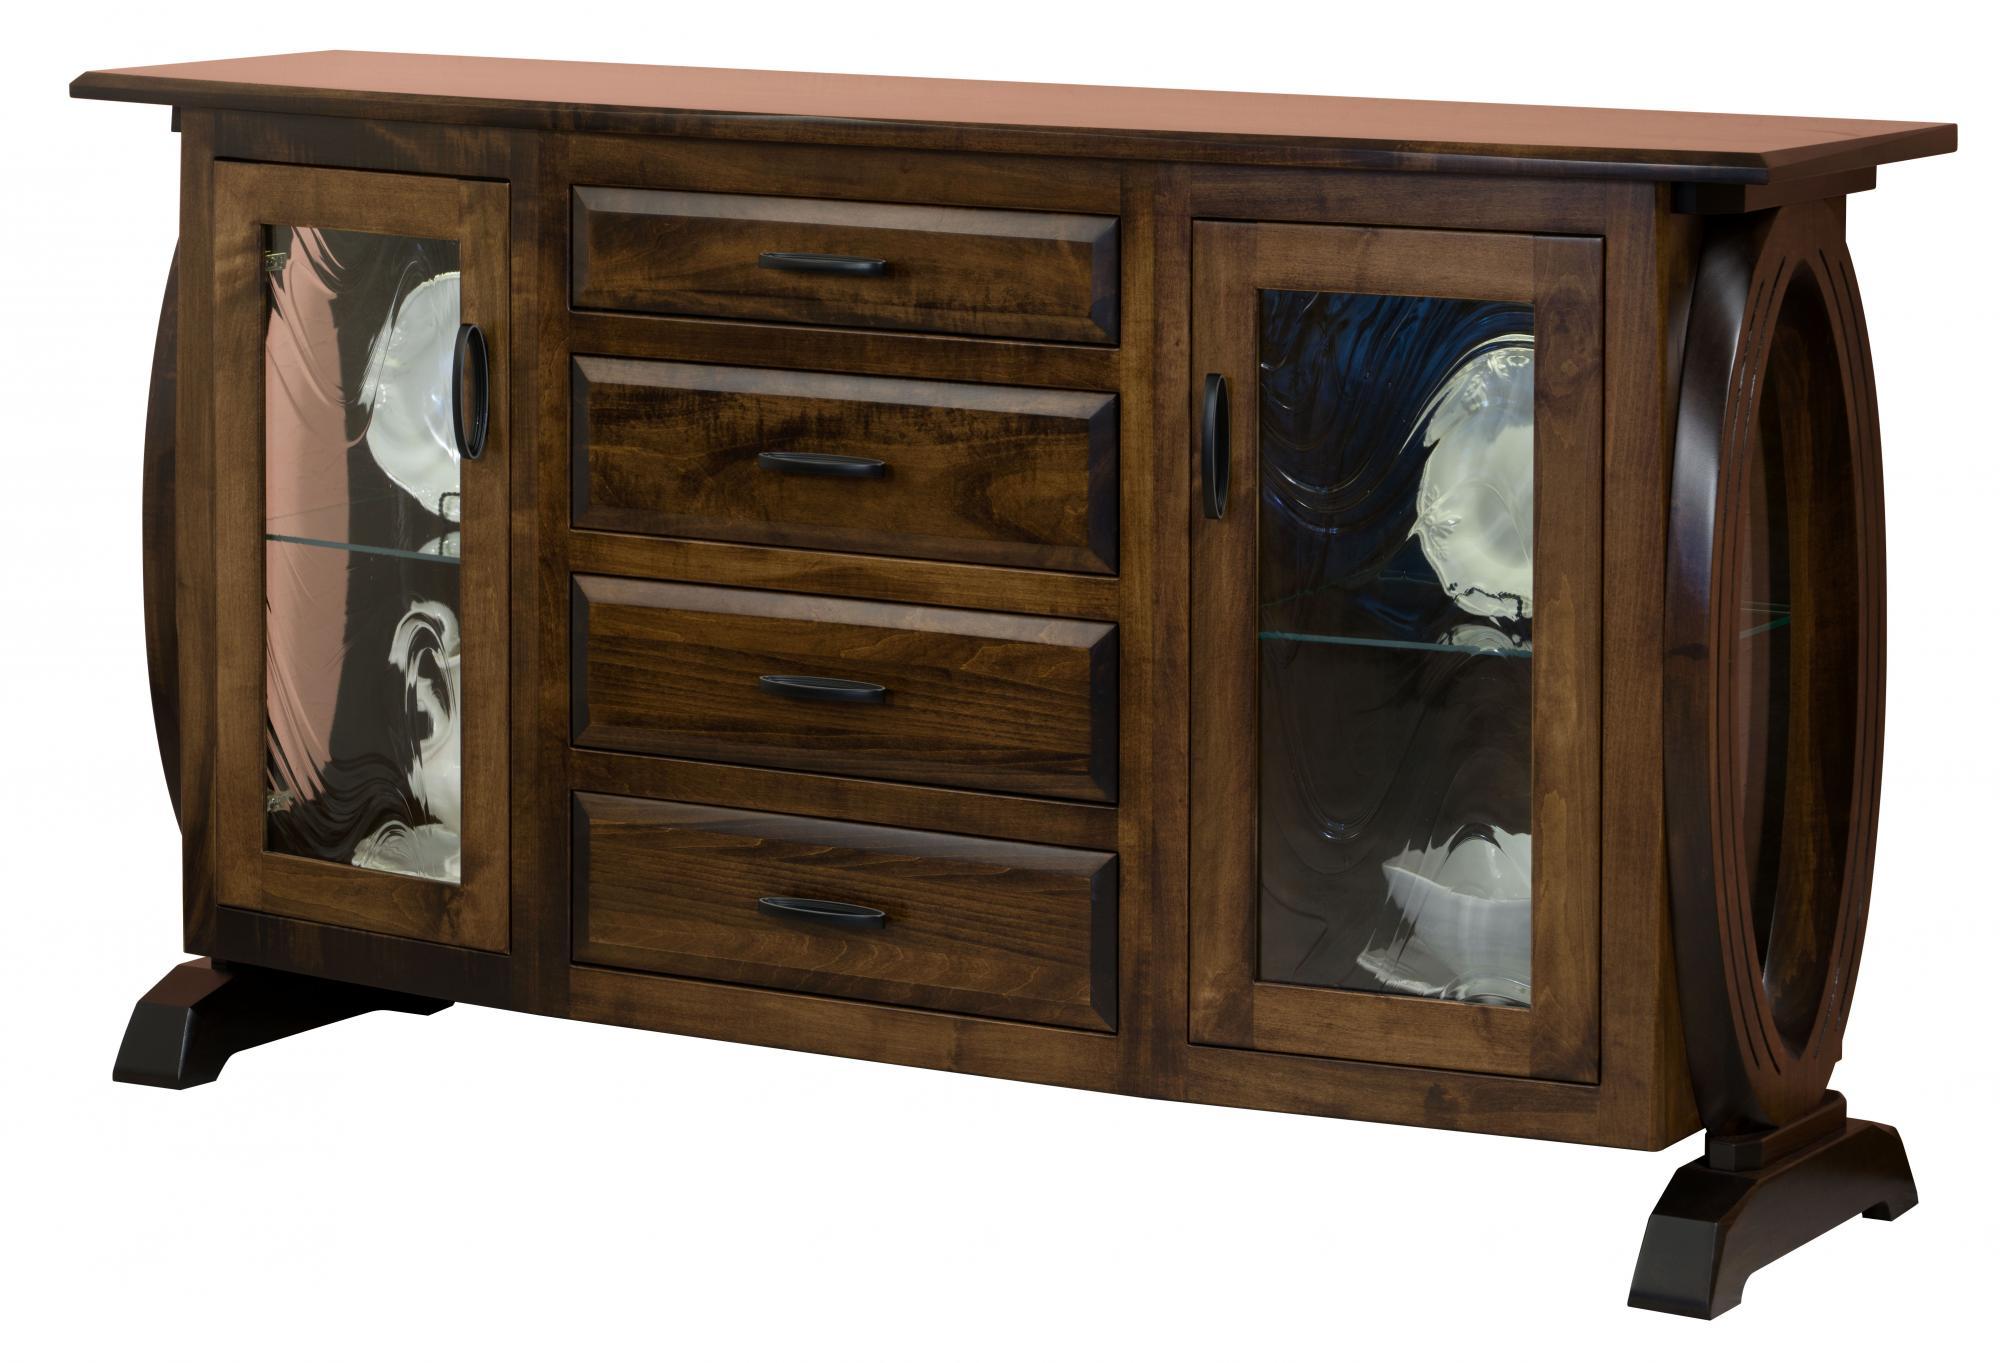 Saratoga Sideboard Amish Furniture Store Mankato Mn